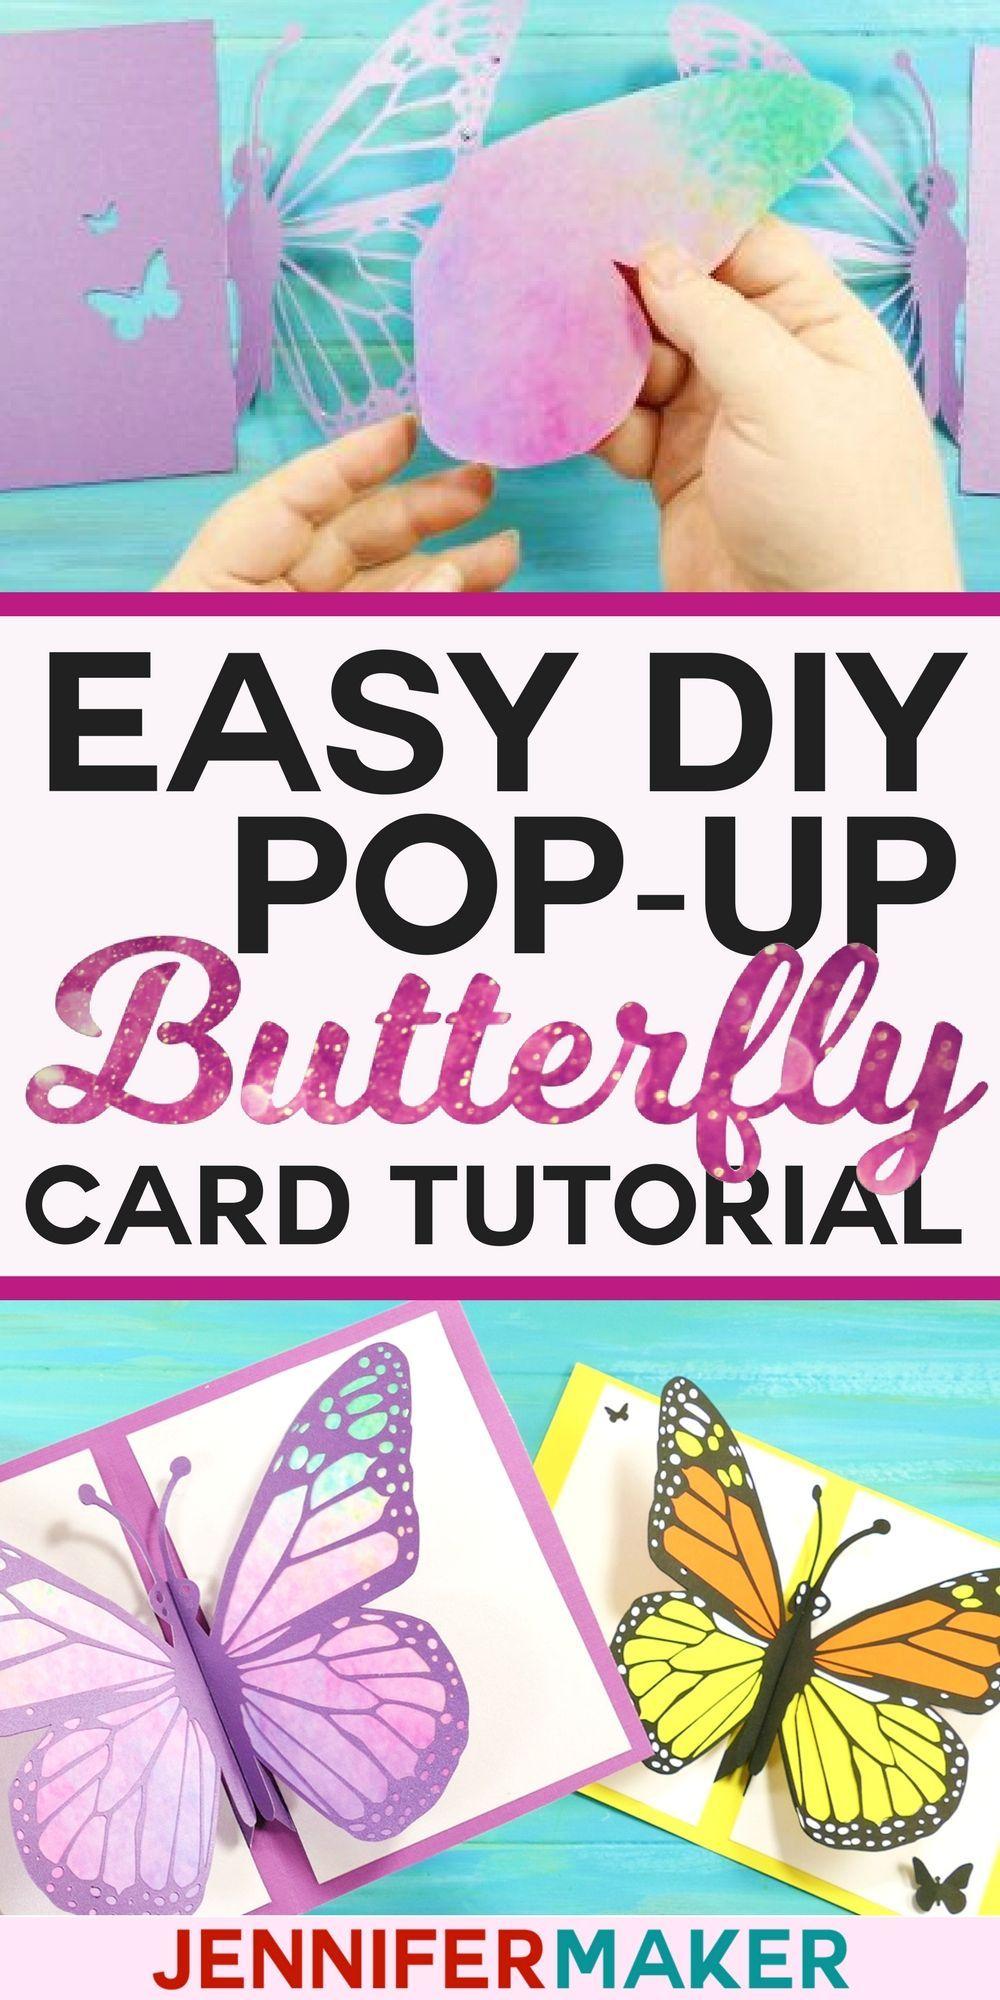 Easy Butterfly Card DIY PopUp Tutorial Cricut birthday